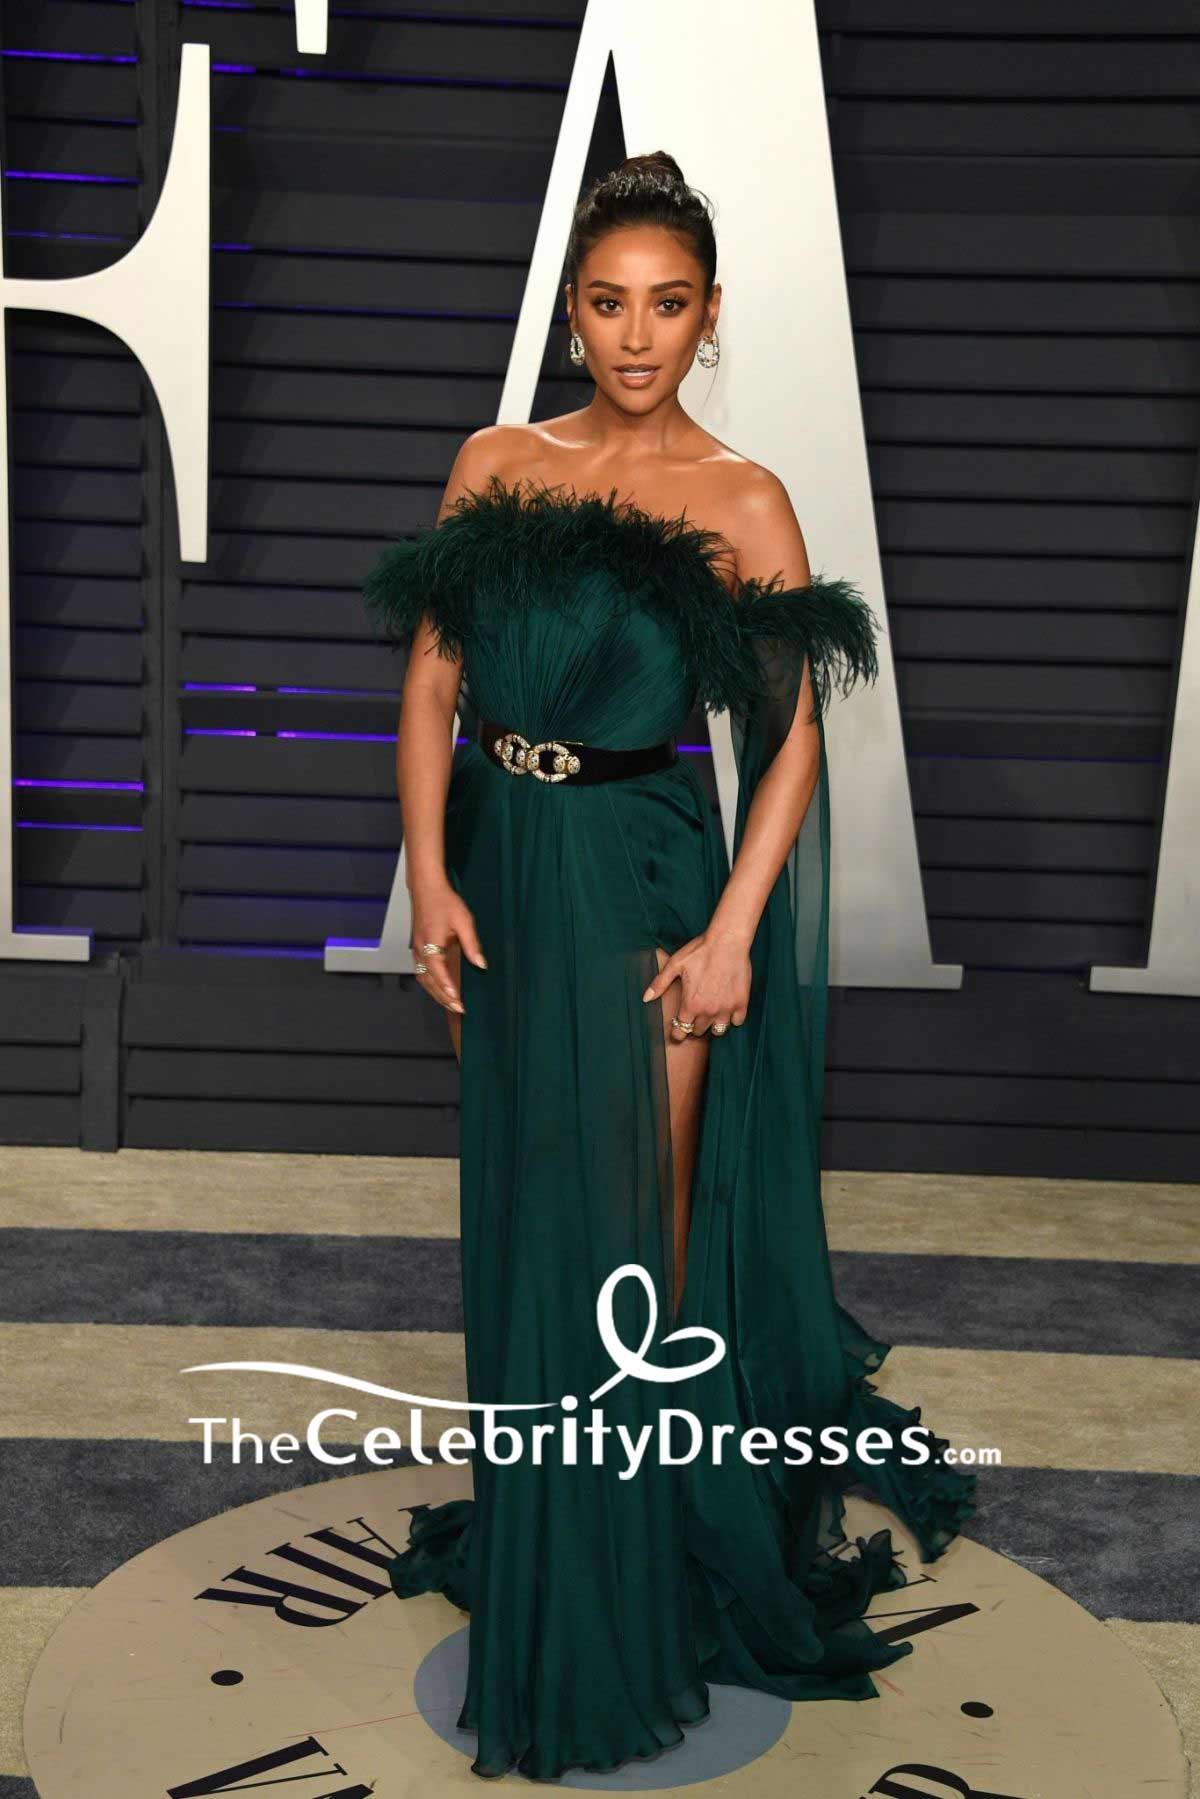 Shay Mitchell Dark Green Off The Shoulder Thigh High Slit Evening Dress 2019 Vanity Fair Oscar Party Thecelebritydresses